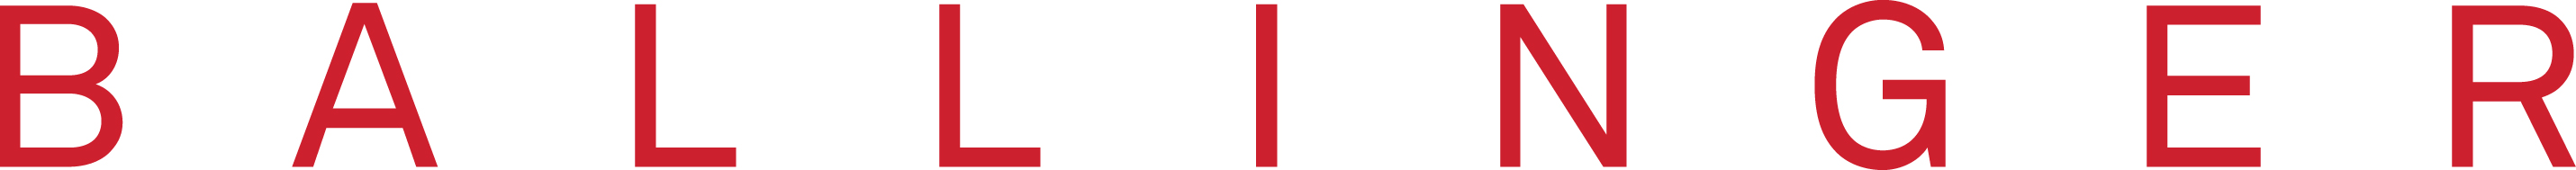 Ballinger Architecture and Engineering logo